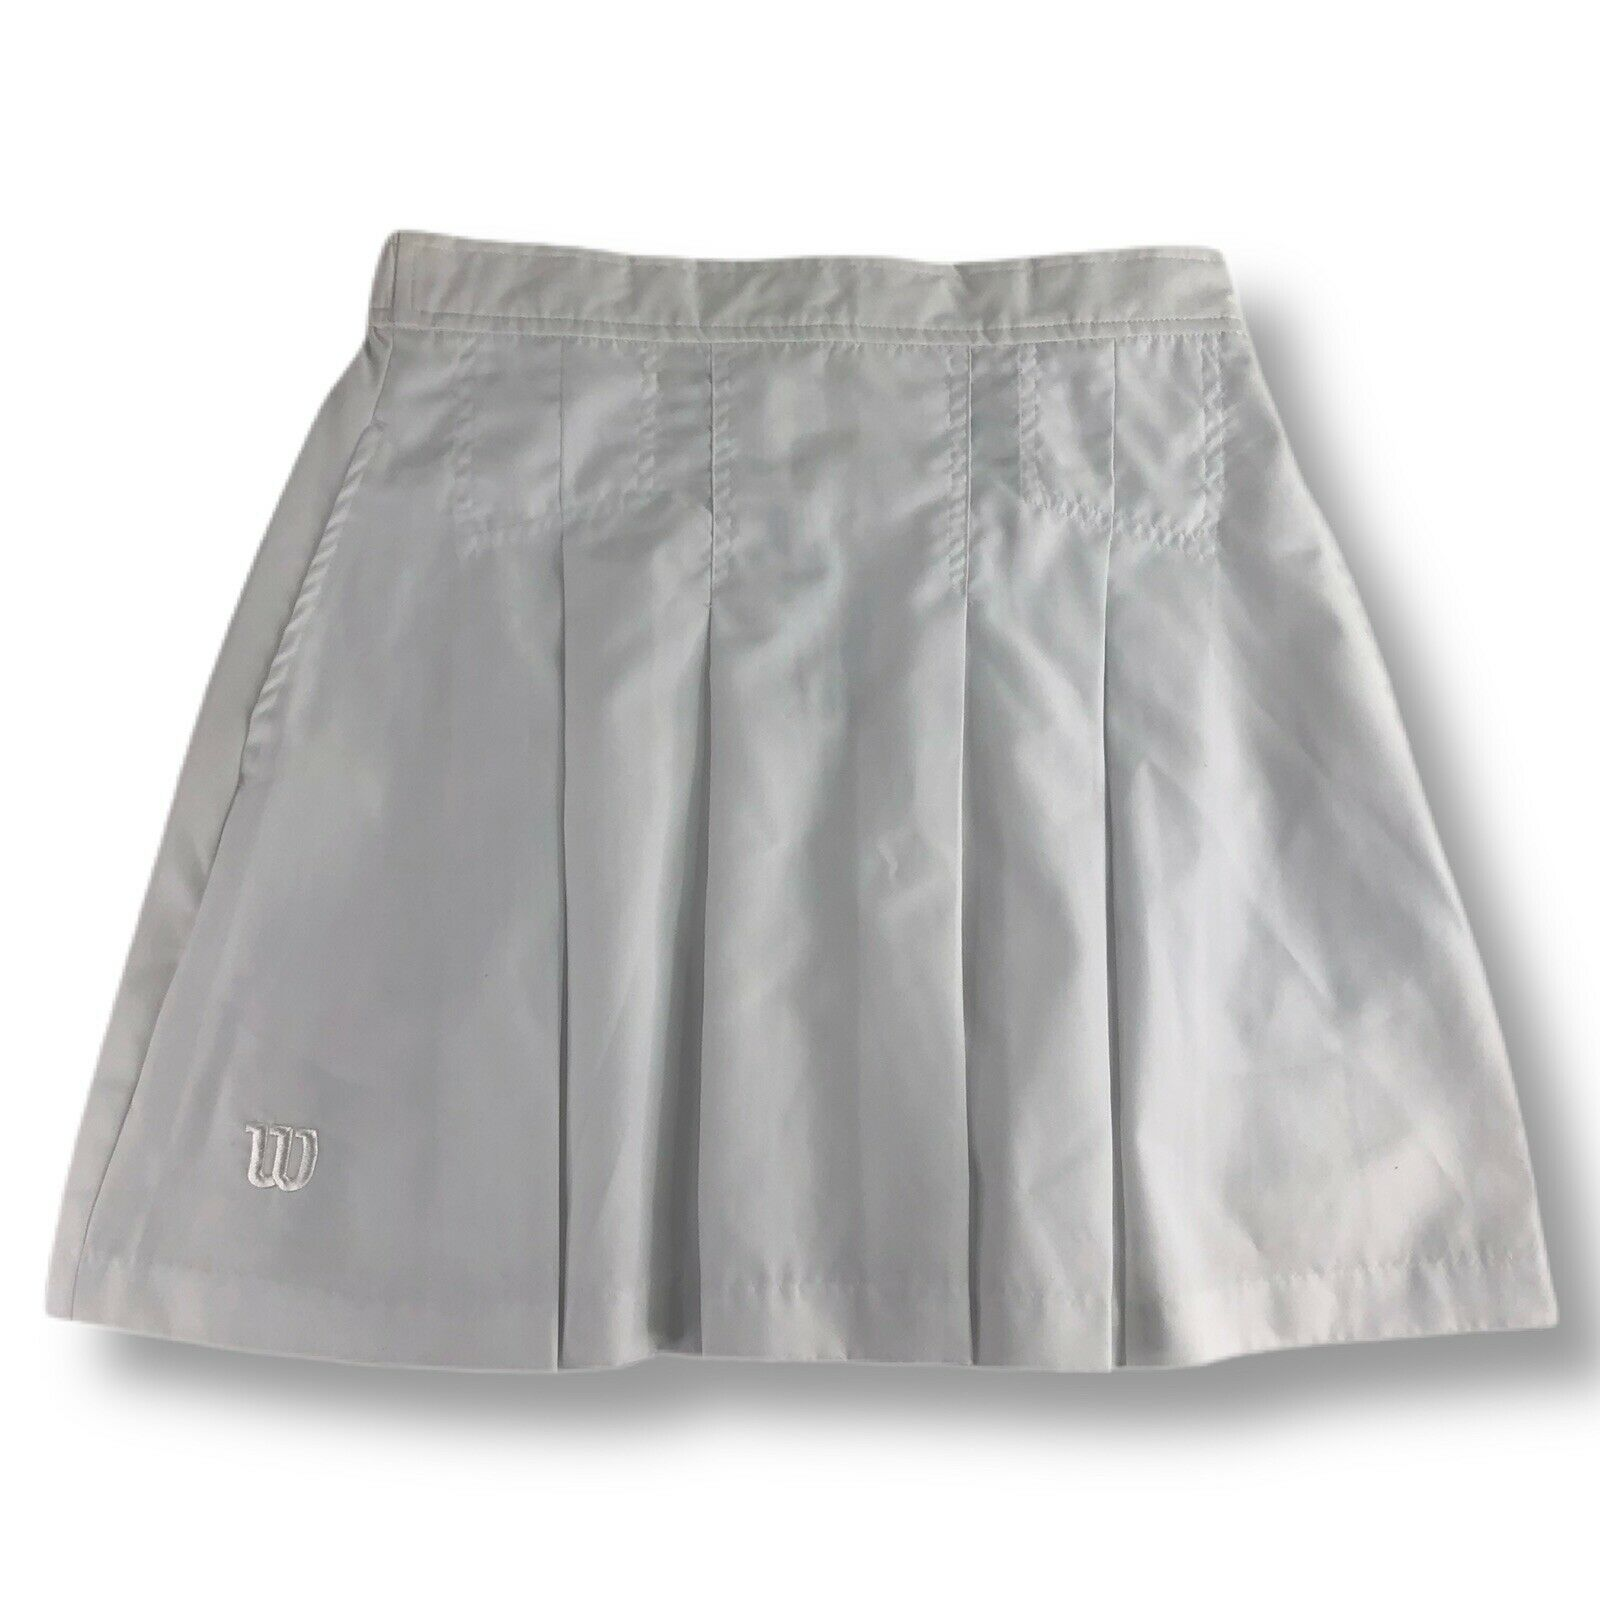 Vintage Wilson White Pleated Tennis Skirt Women's Size 8 Polyester NWOT Unused